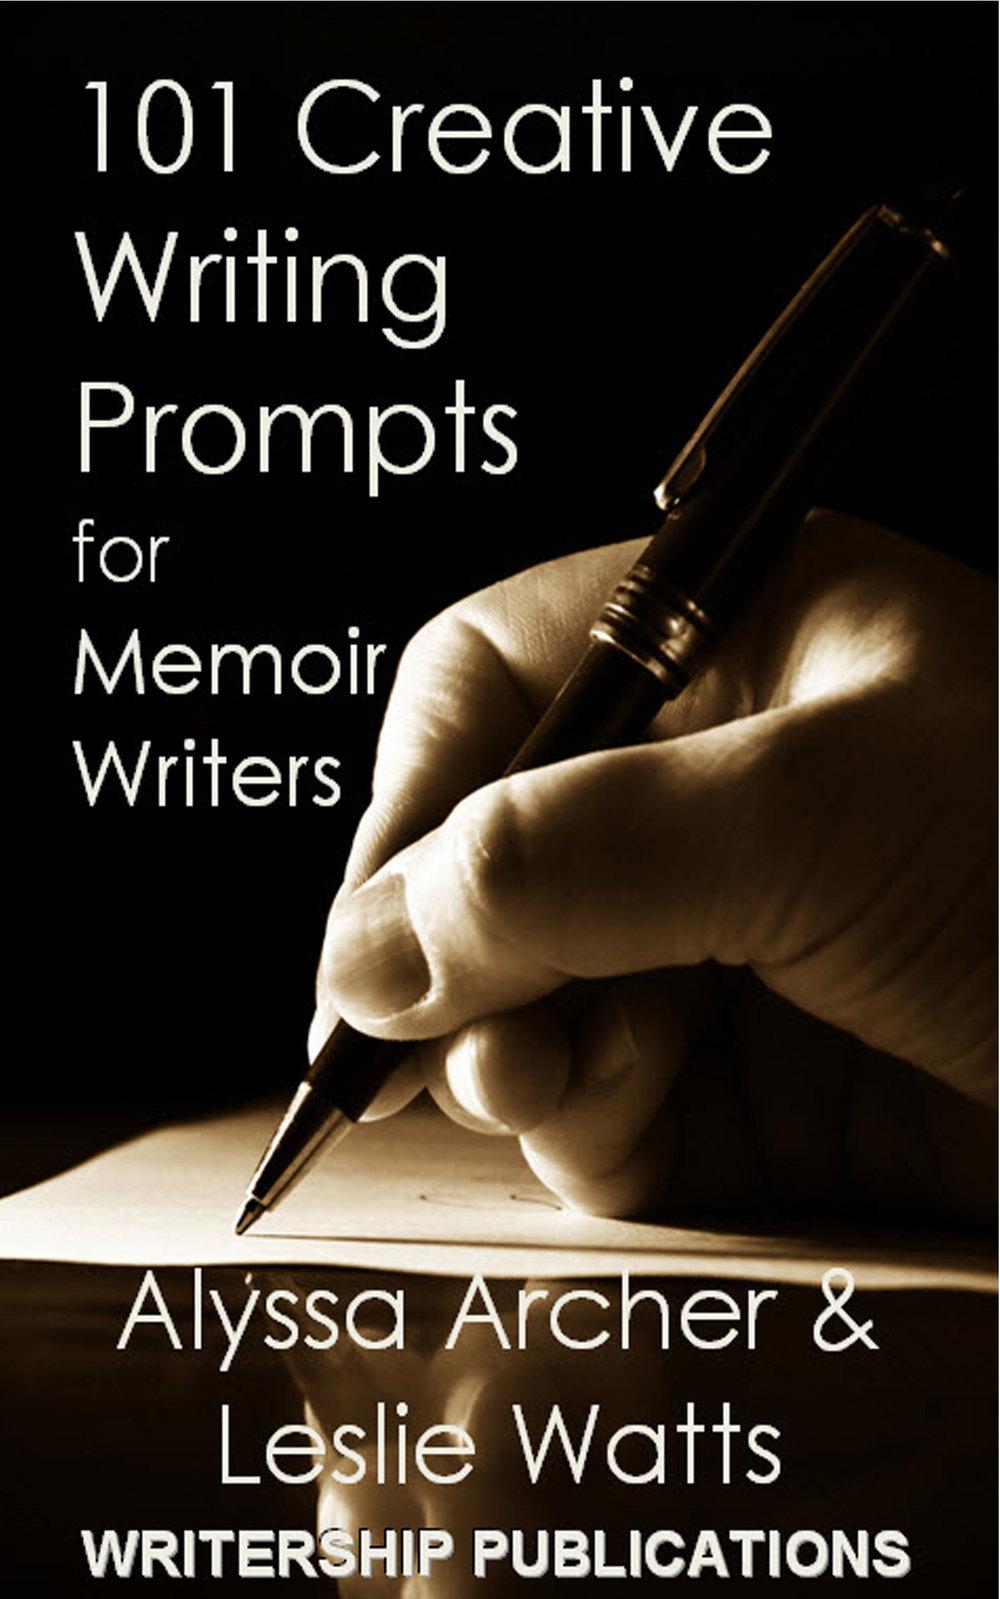 Creative-Writing-Prompts-for-Memoir-Writers.jpg